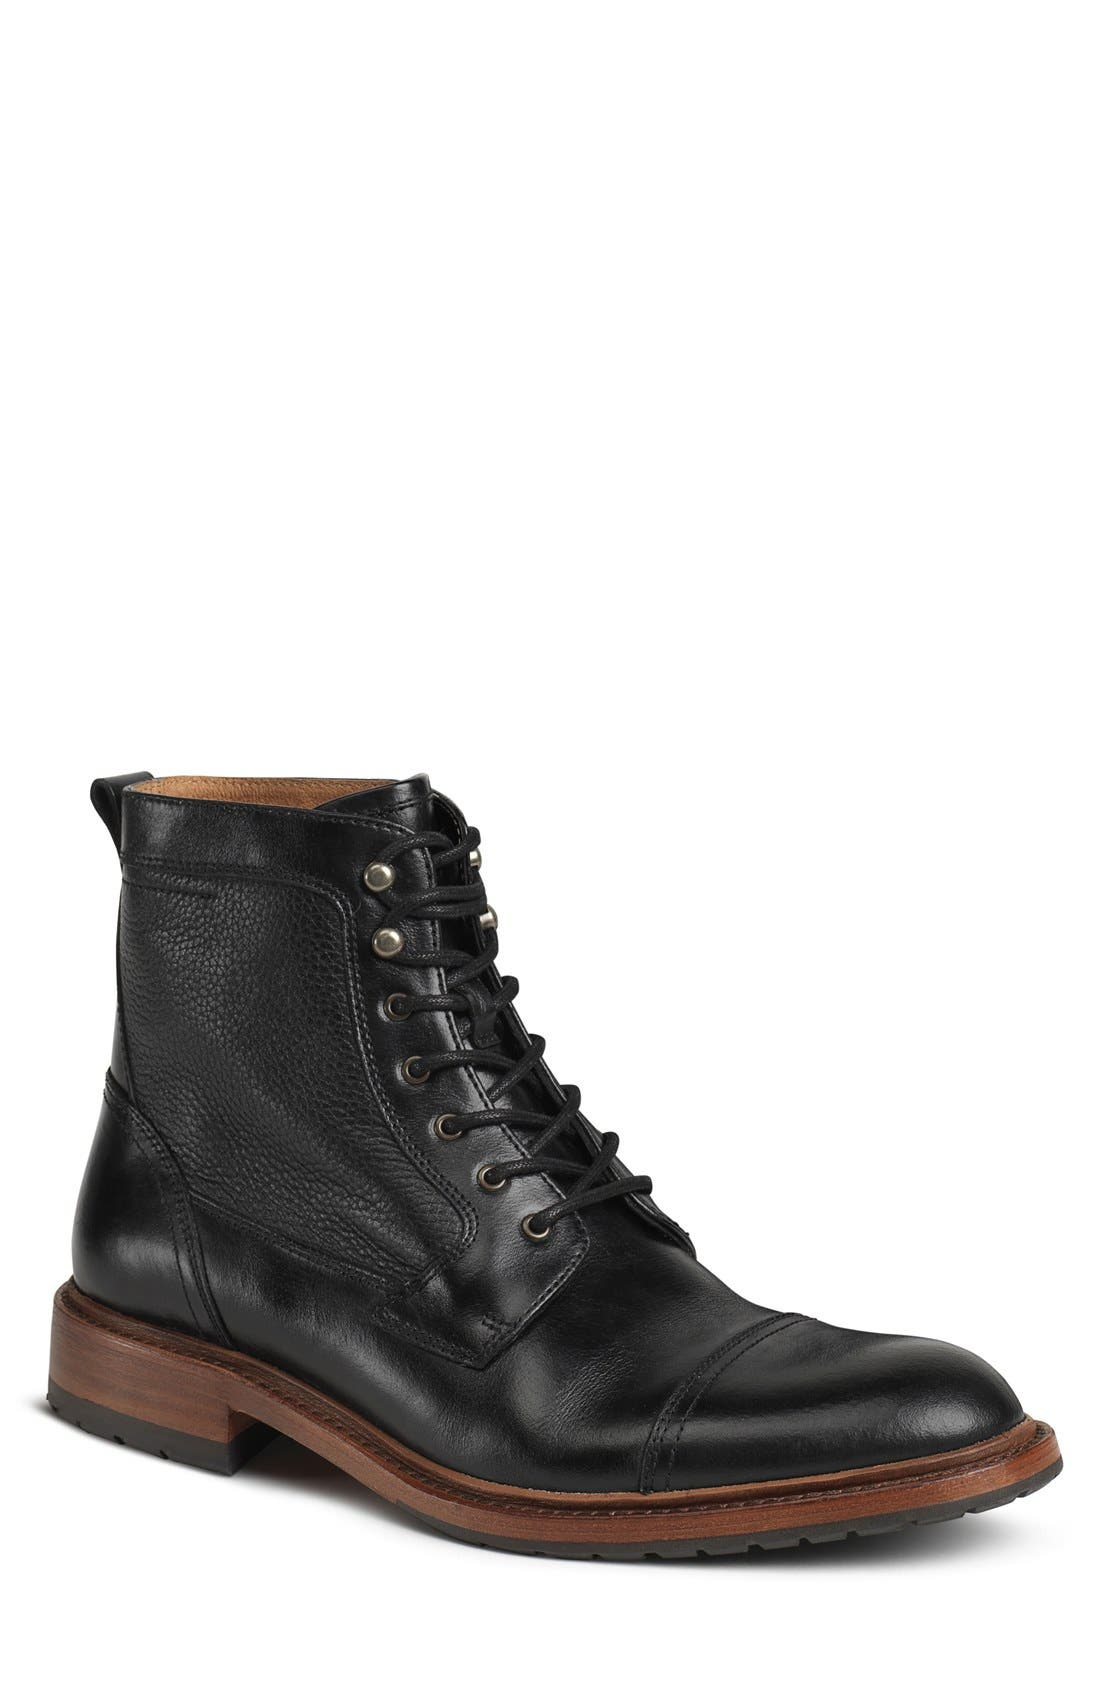 'Lowell' Cap Toe Boot,                         Main,                         color, BLACK